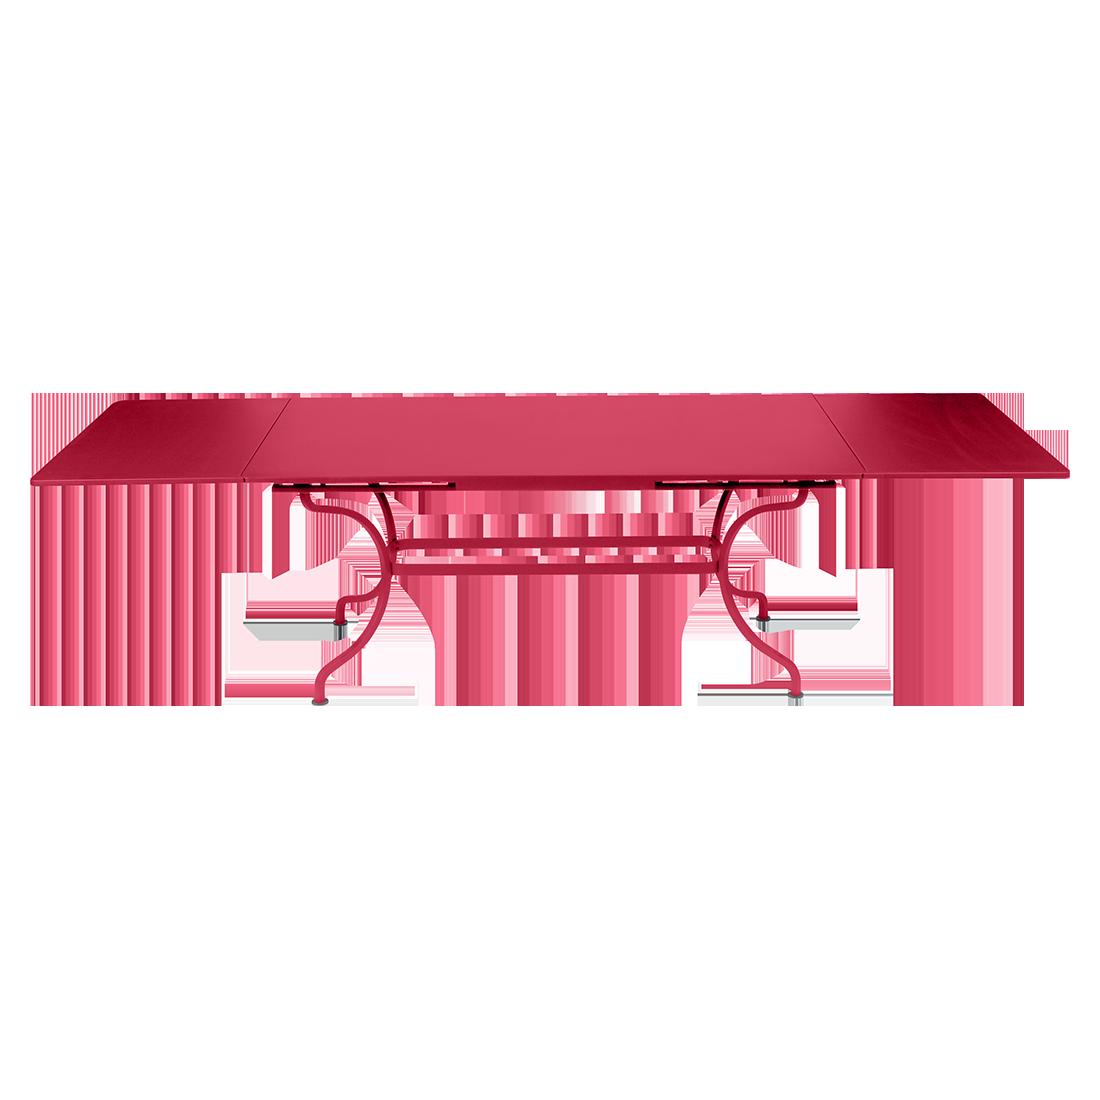 table de jardin a allonge, table metal rallonge, grande table rectangulaire, grande table rose